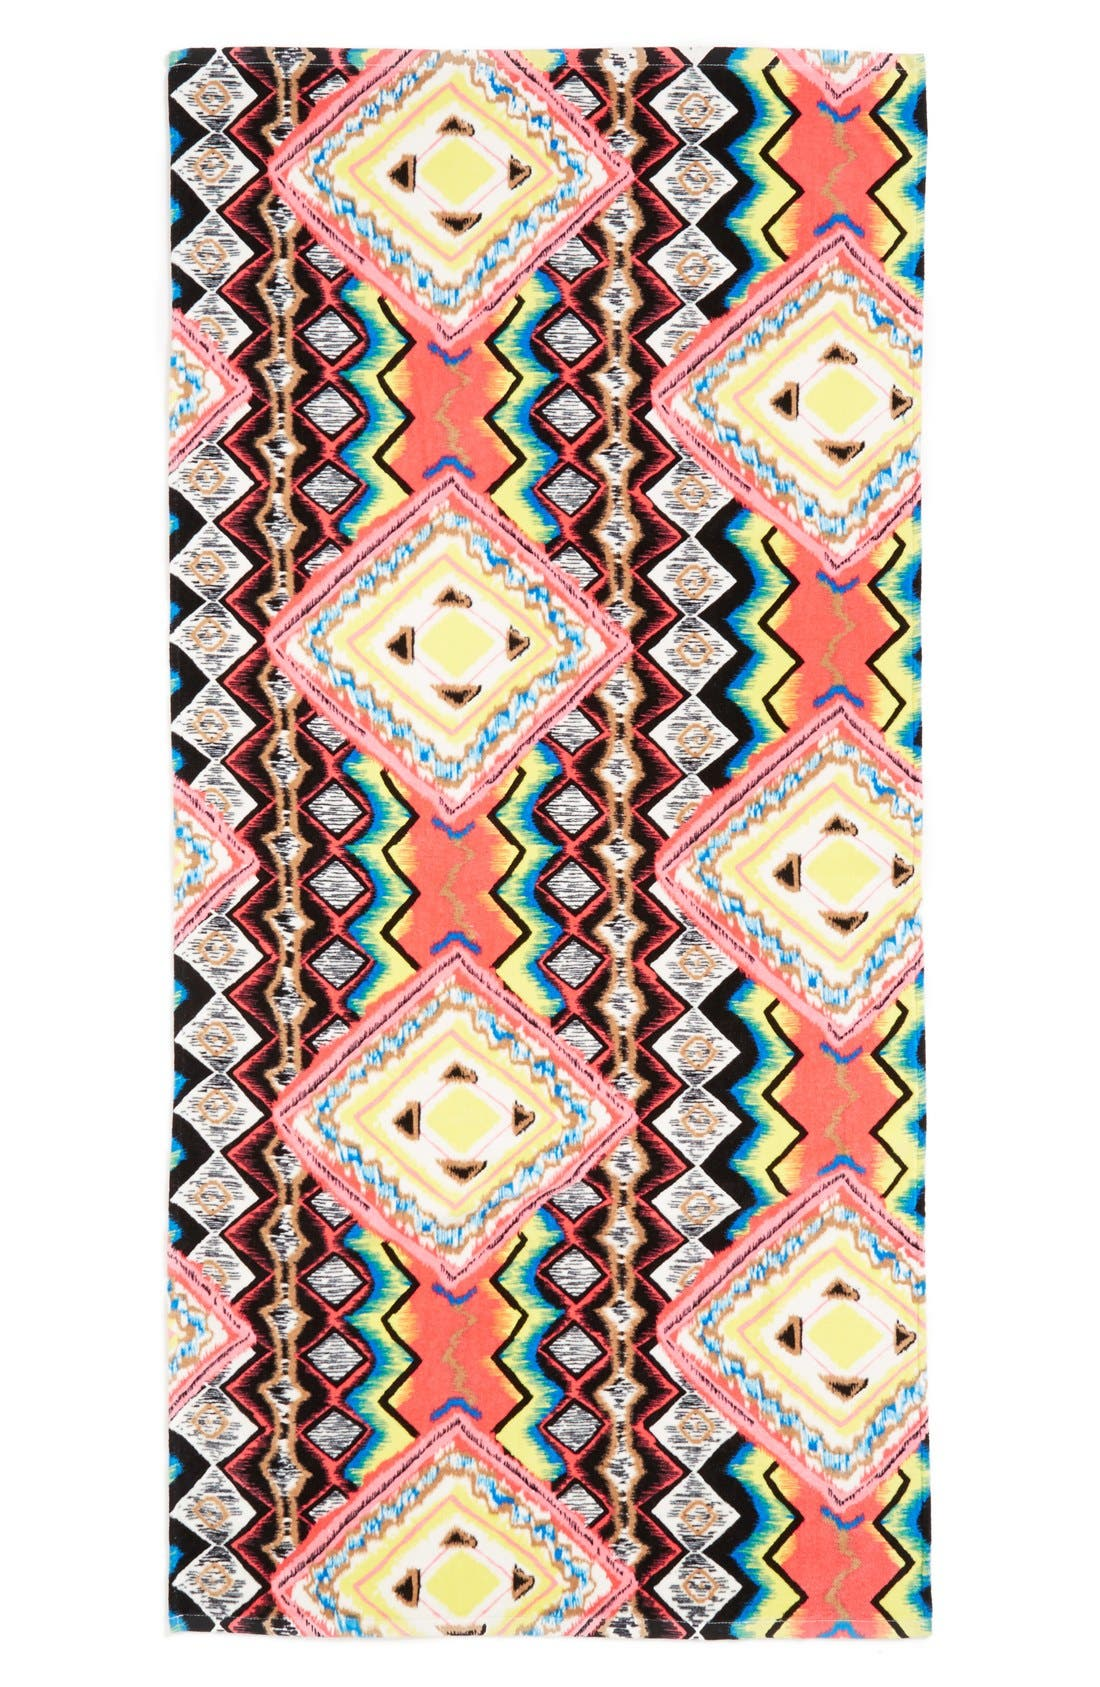 Alternate Image 1 Selected - Volcom 'City Lights' Print Towel